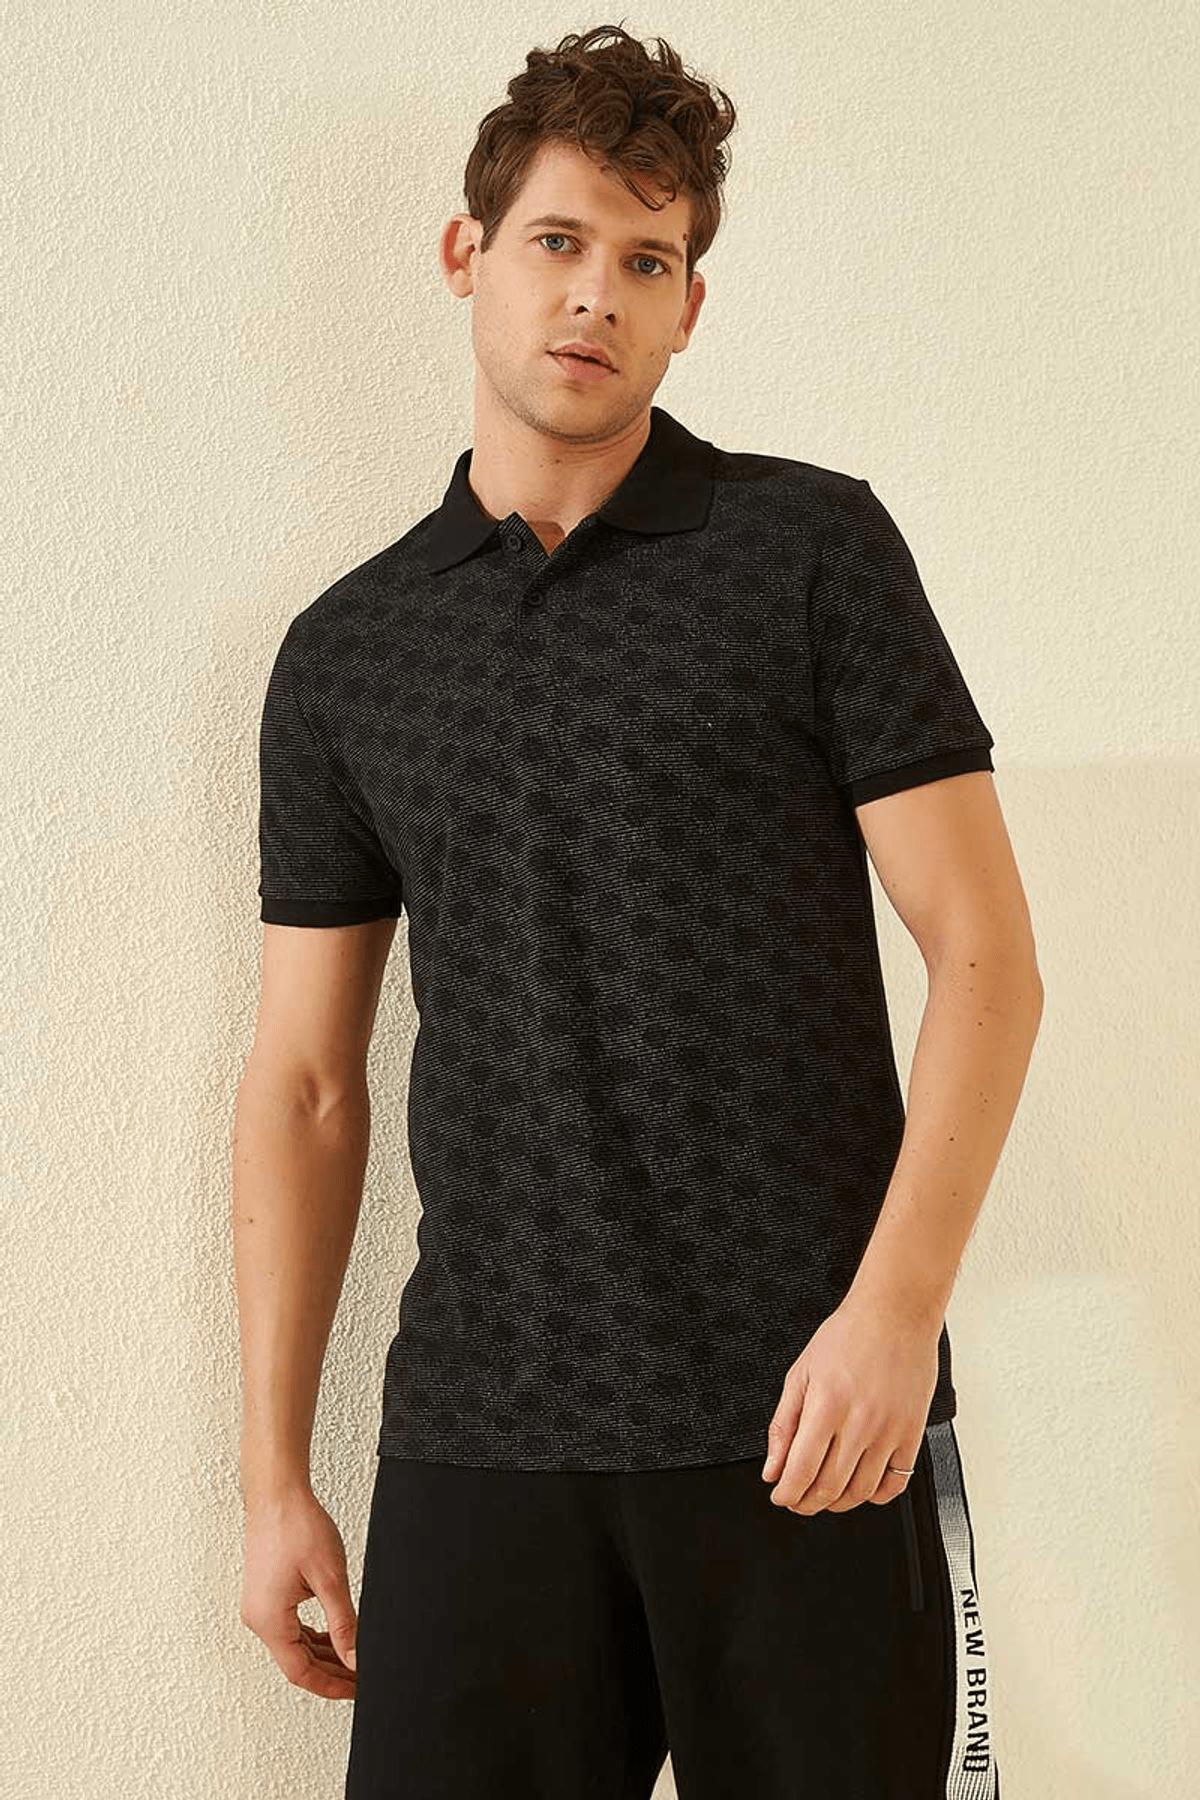 Tommy Life Baskılı Polo Yaka Siyah Erkek T-Shirt T08ER-87796_1 3